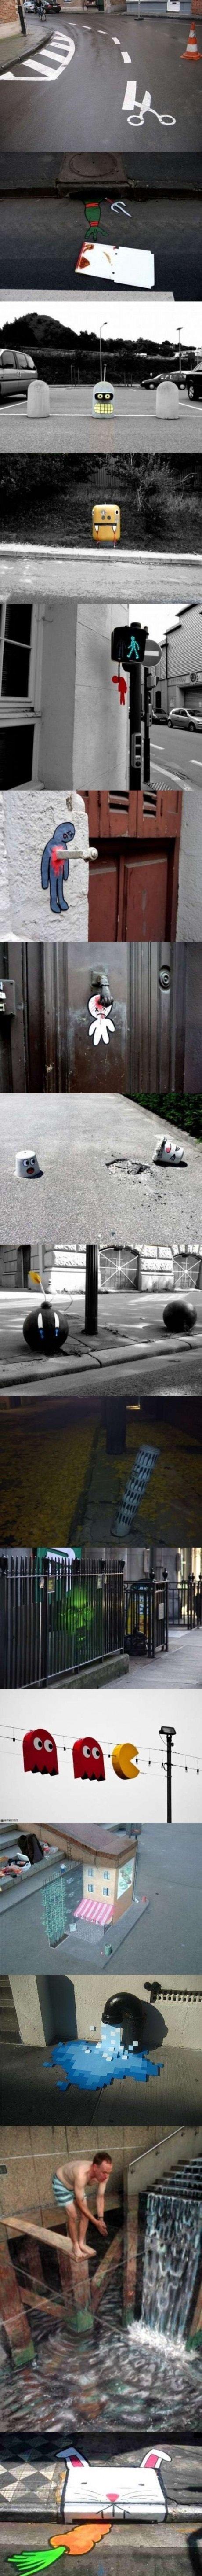 Street Art = Mind Blow. cool street art. yvv Cryd. REPPOOSSSSSSSTTTTT cool street Art mind blown Awesome